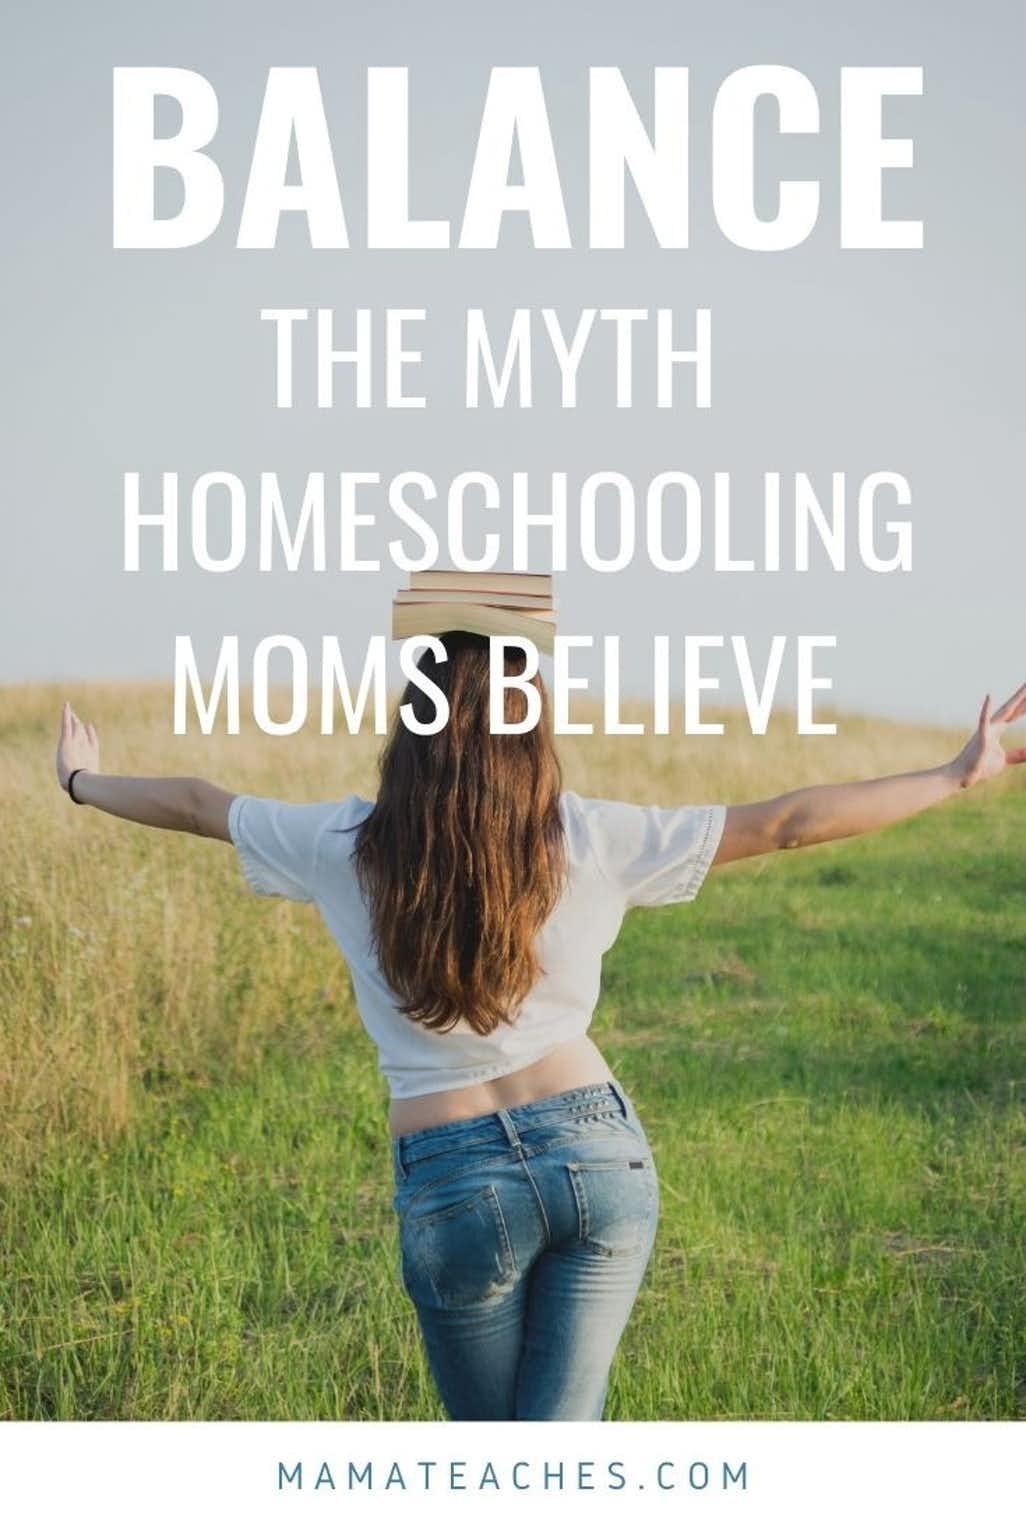 Finding Balance - The Myth That Homeschool Moms Believe